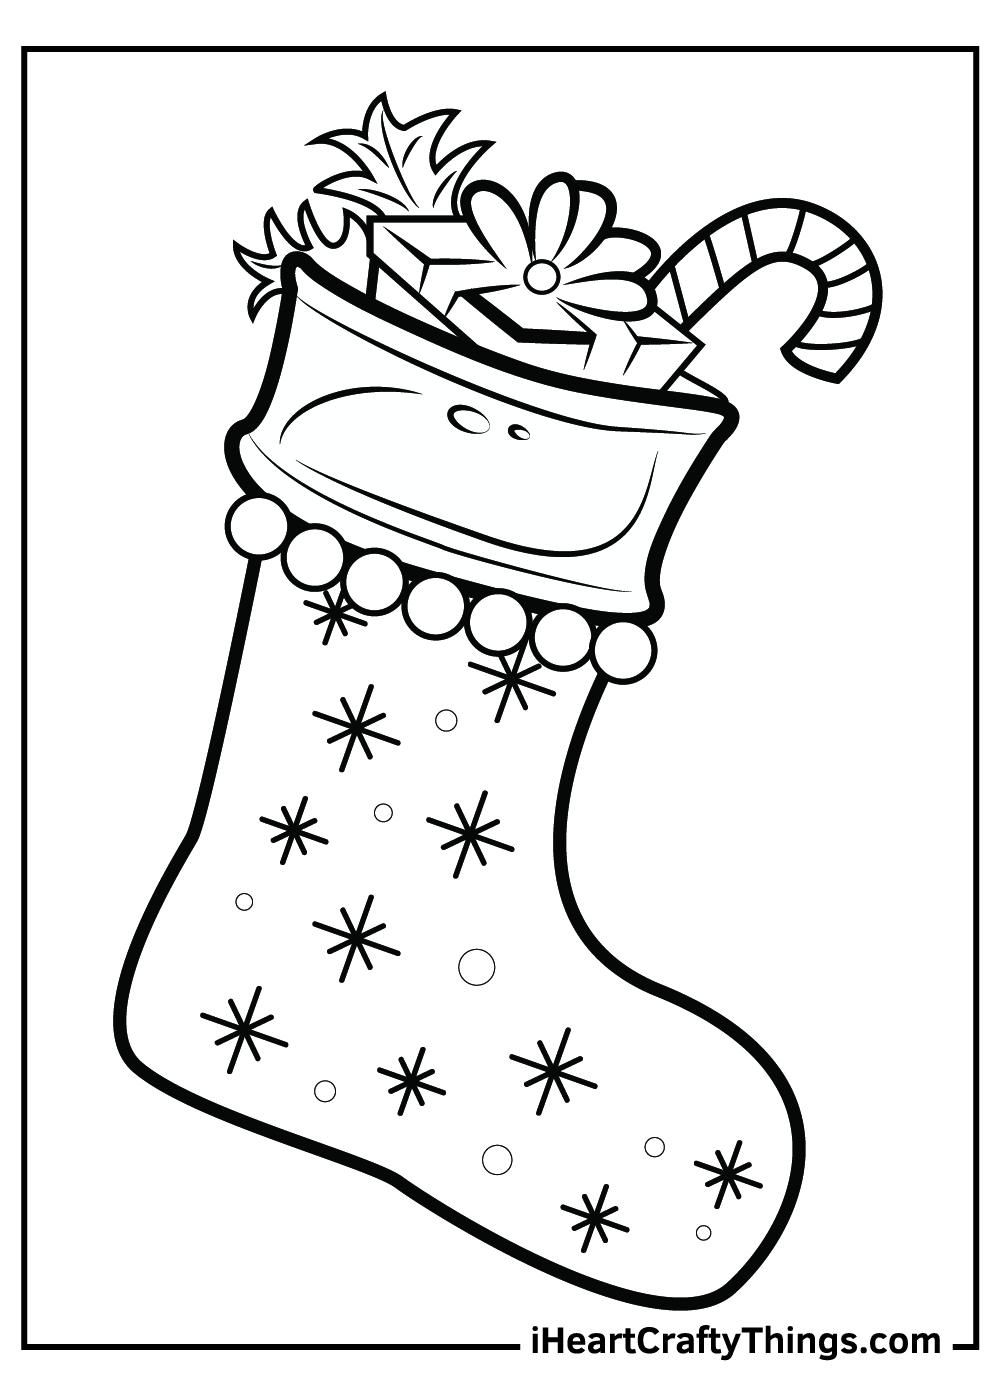 free printable snowflake Christmas stocking coloring sheet